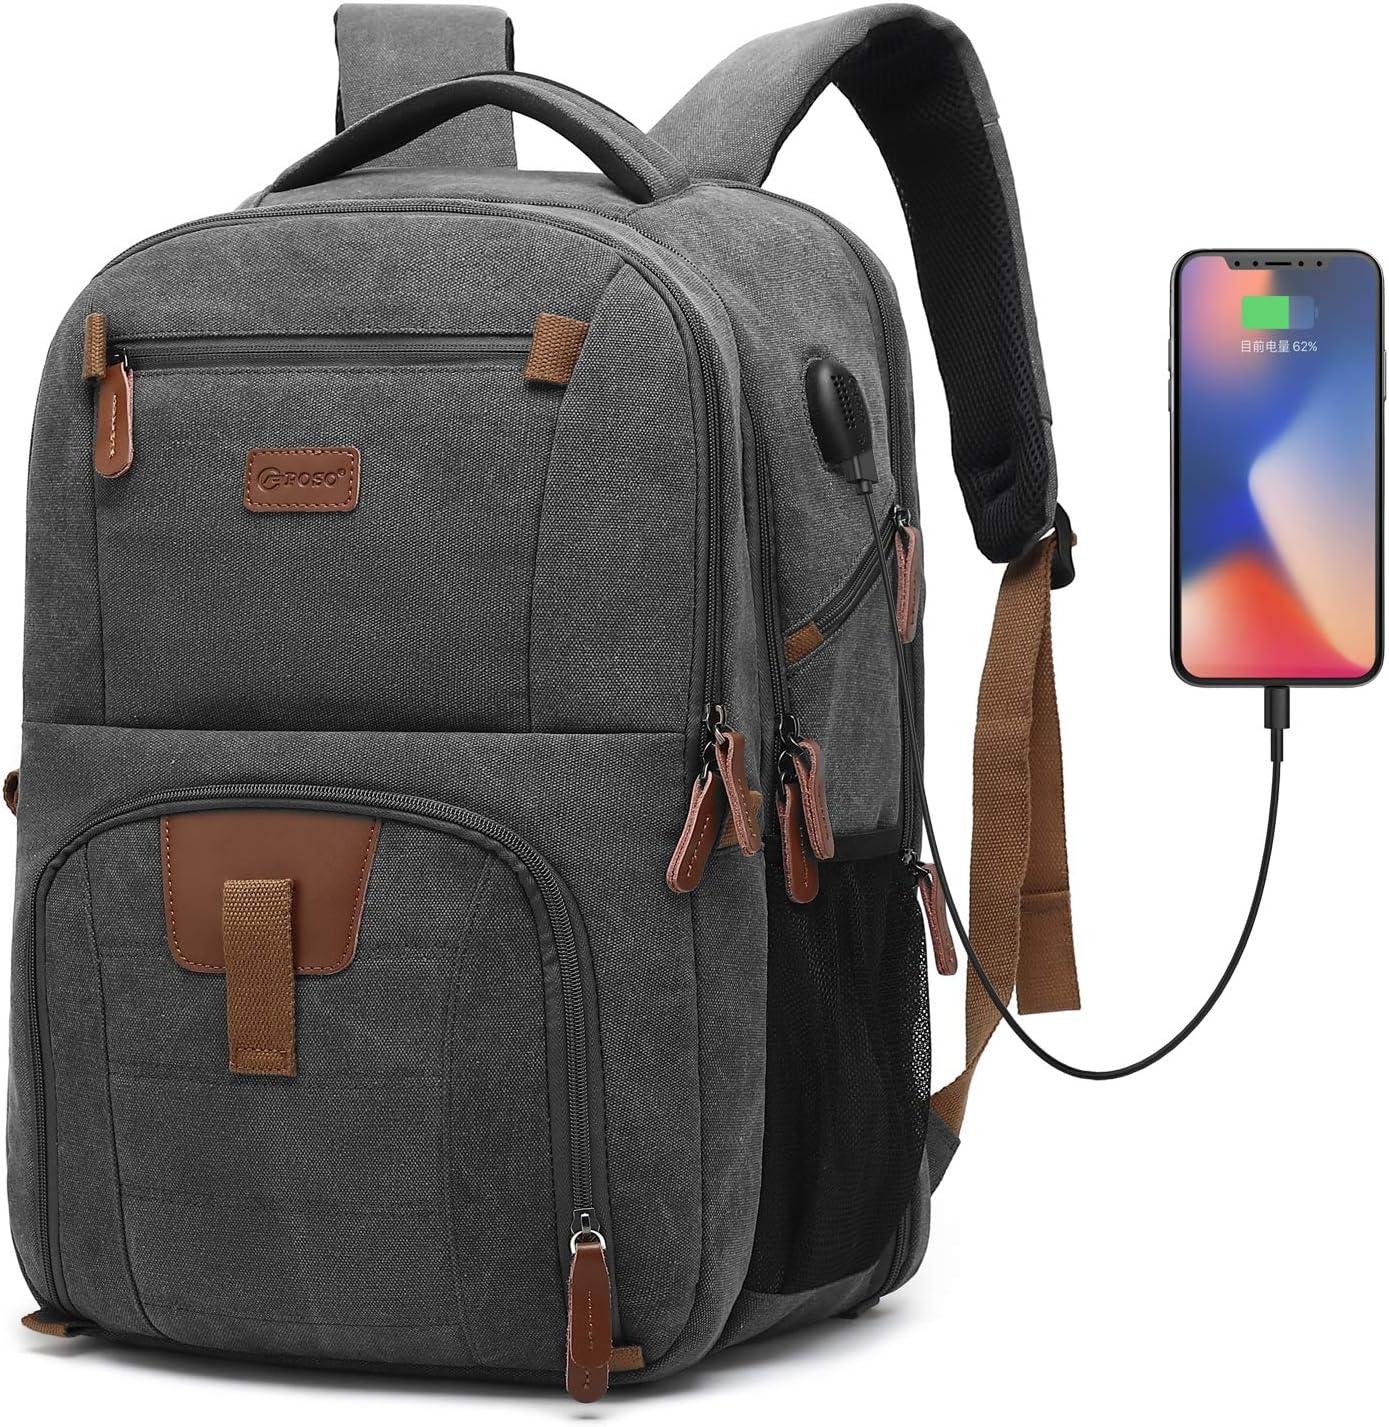 POSO Laptop Travel Backpack 17.3 Inch Computer Bag with USB Port Business Rucksack Hiking Knapsack Multi-Compartment Men Backpack for Dell Alienware Series/HP/Lenovo/Acer (Canvas Dark Grey)